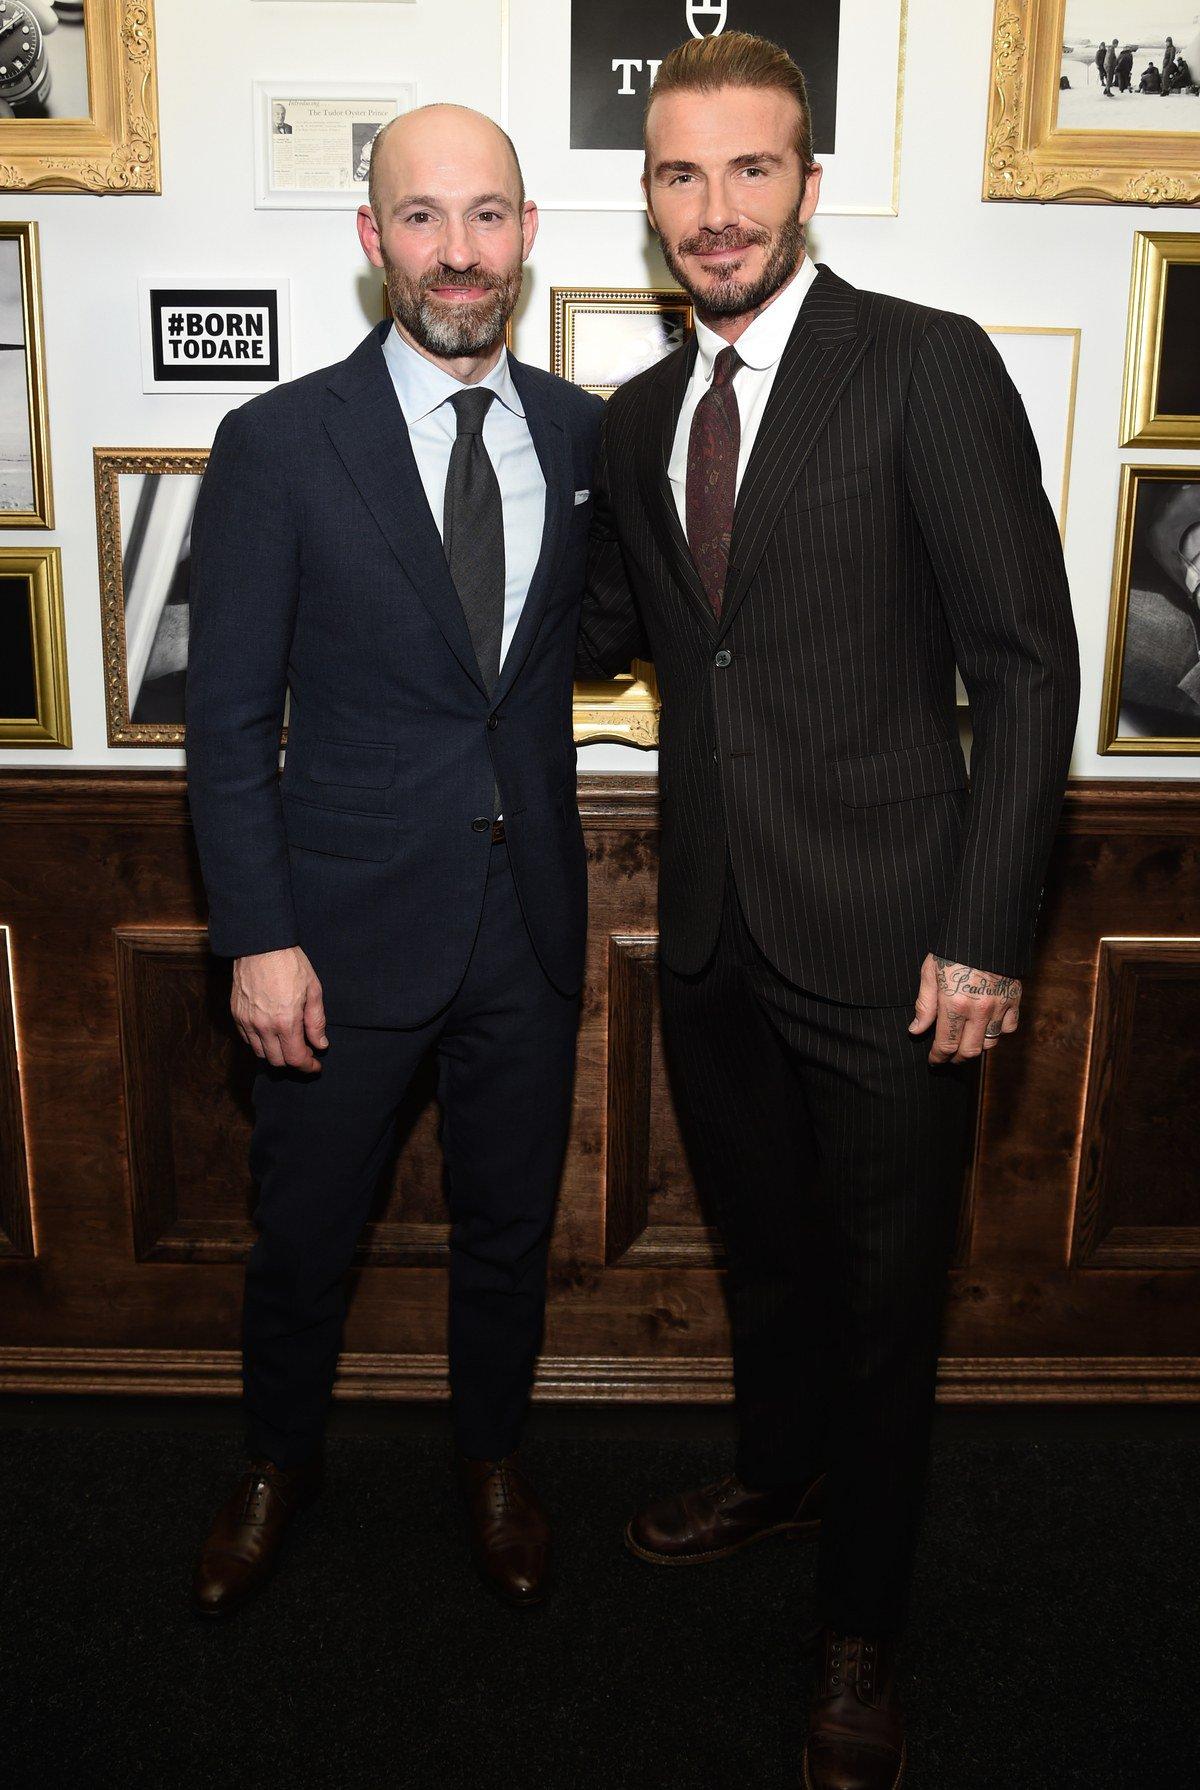 The best-dressed men of the week https://t.co/4AnQEL2pdN https://t.co/7KCzkM0Xcu